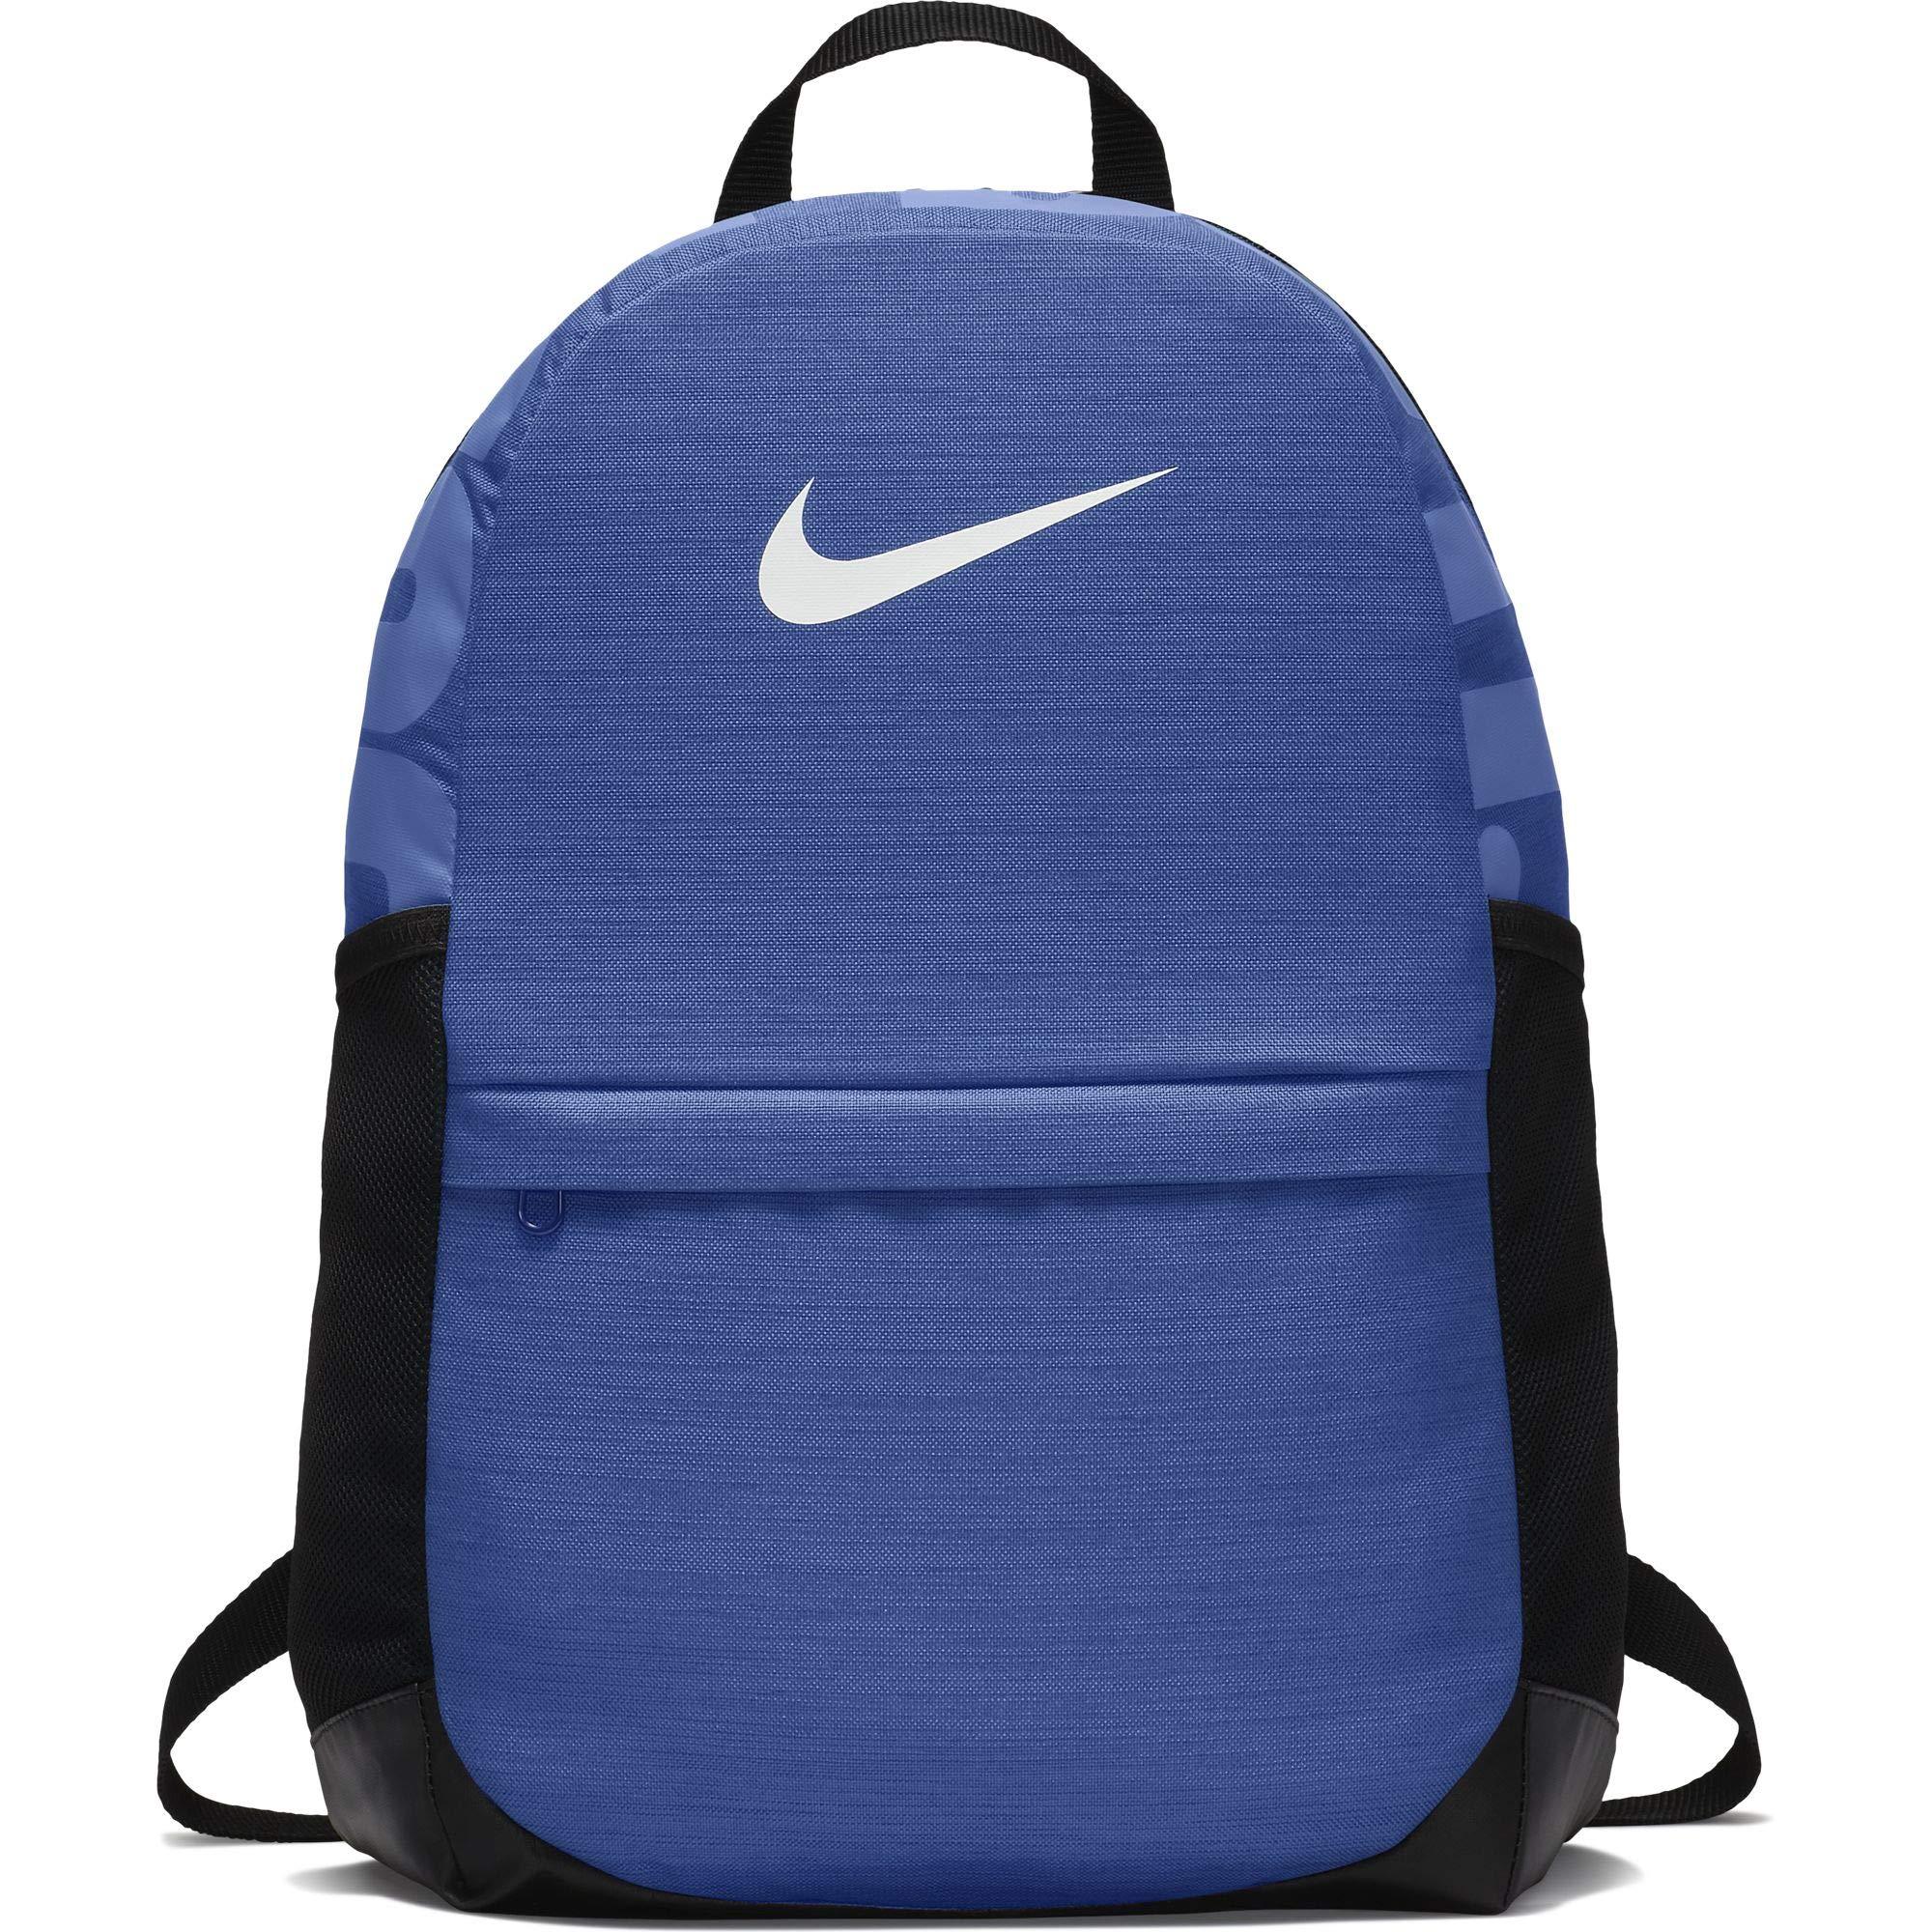 Nike Kid's Brasilia Backpack, Game Royal/Black/White, One Size